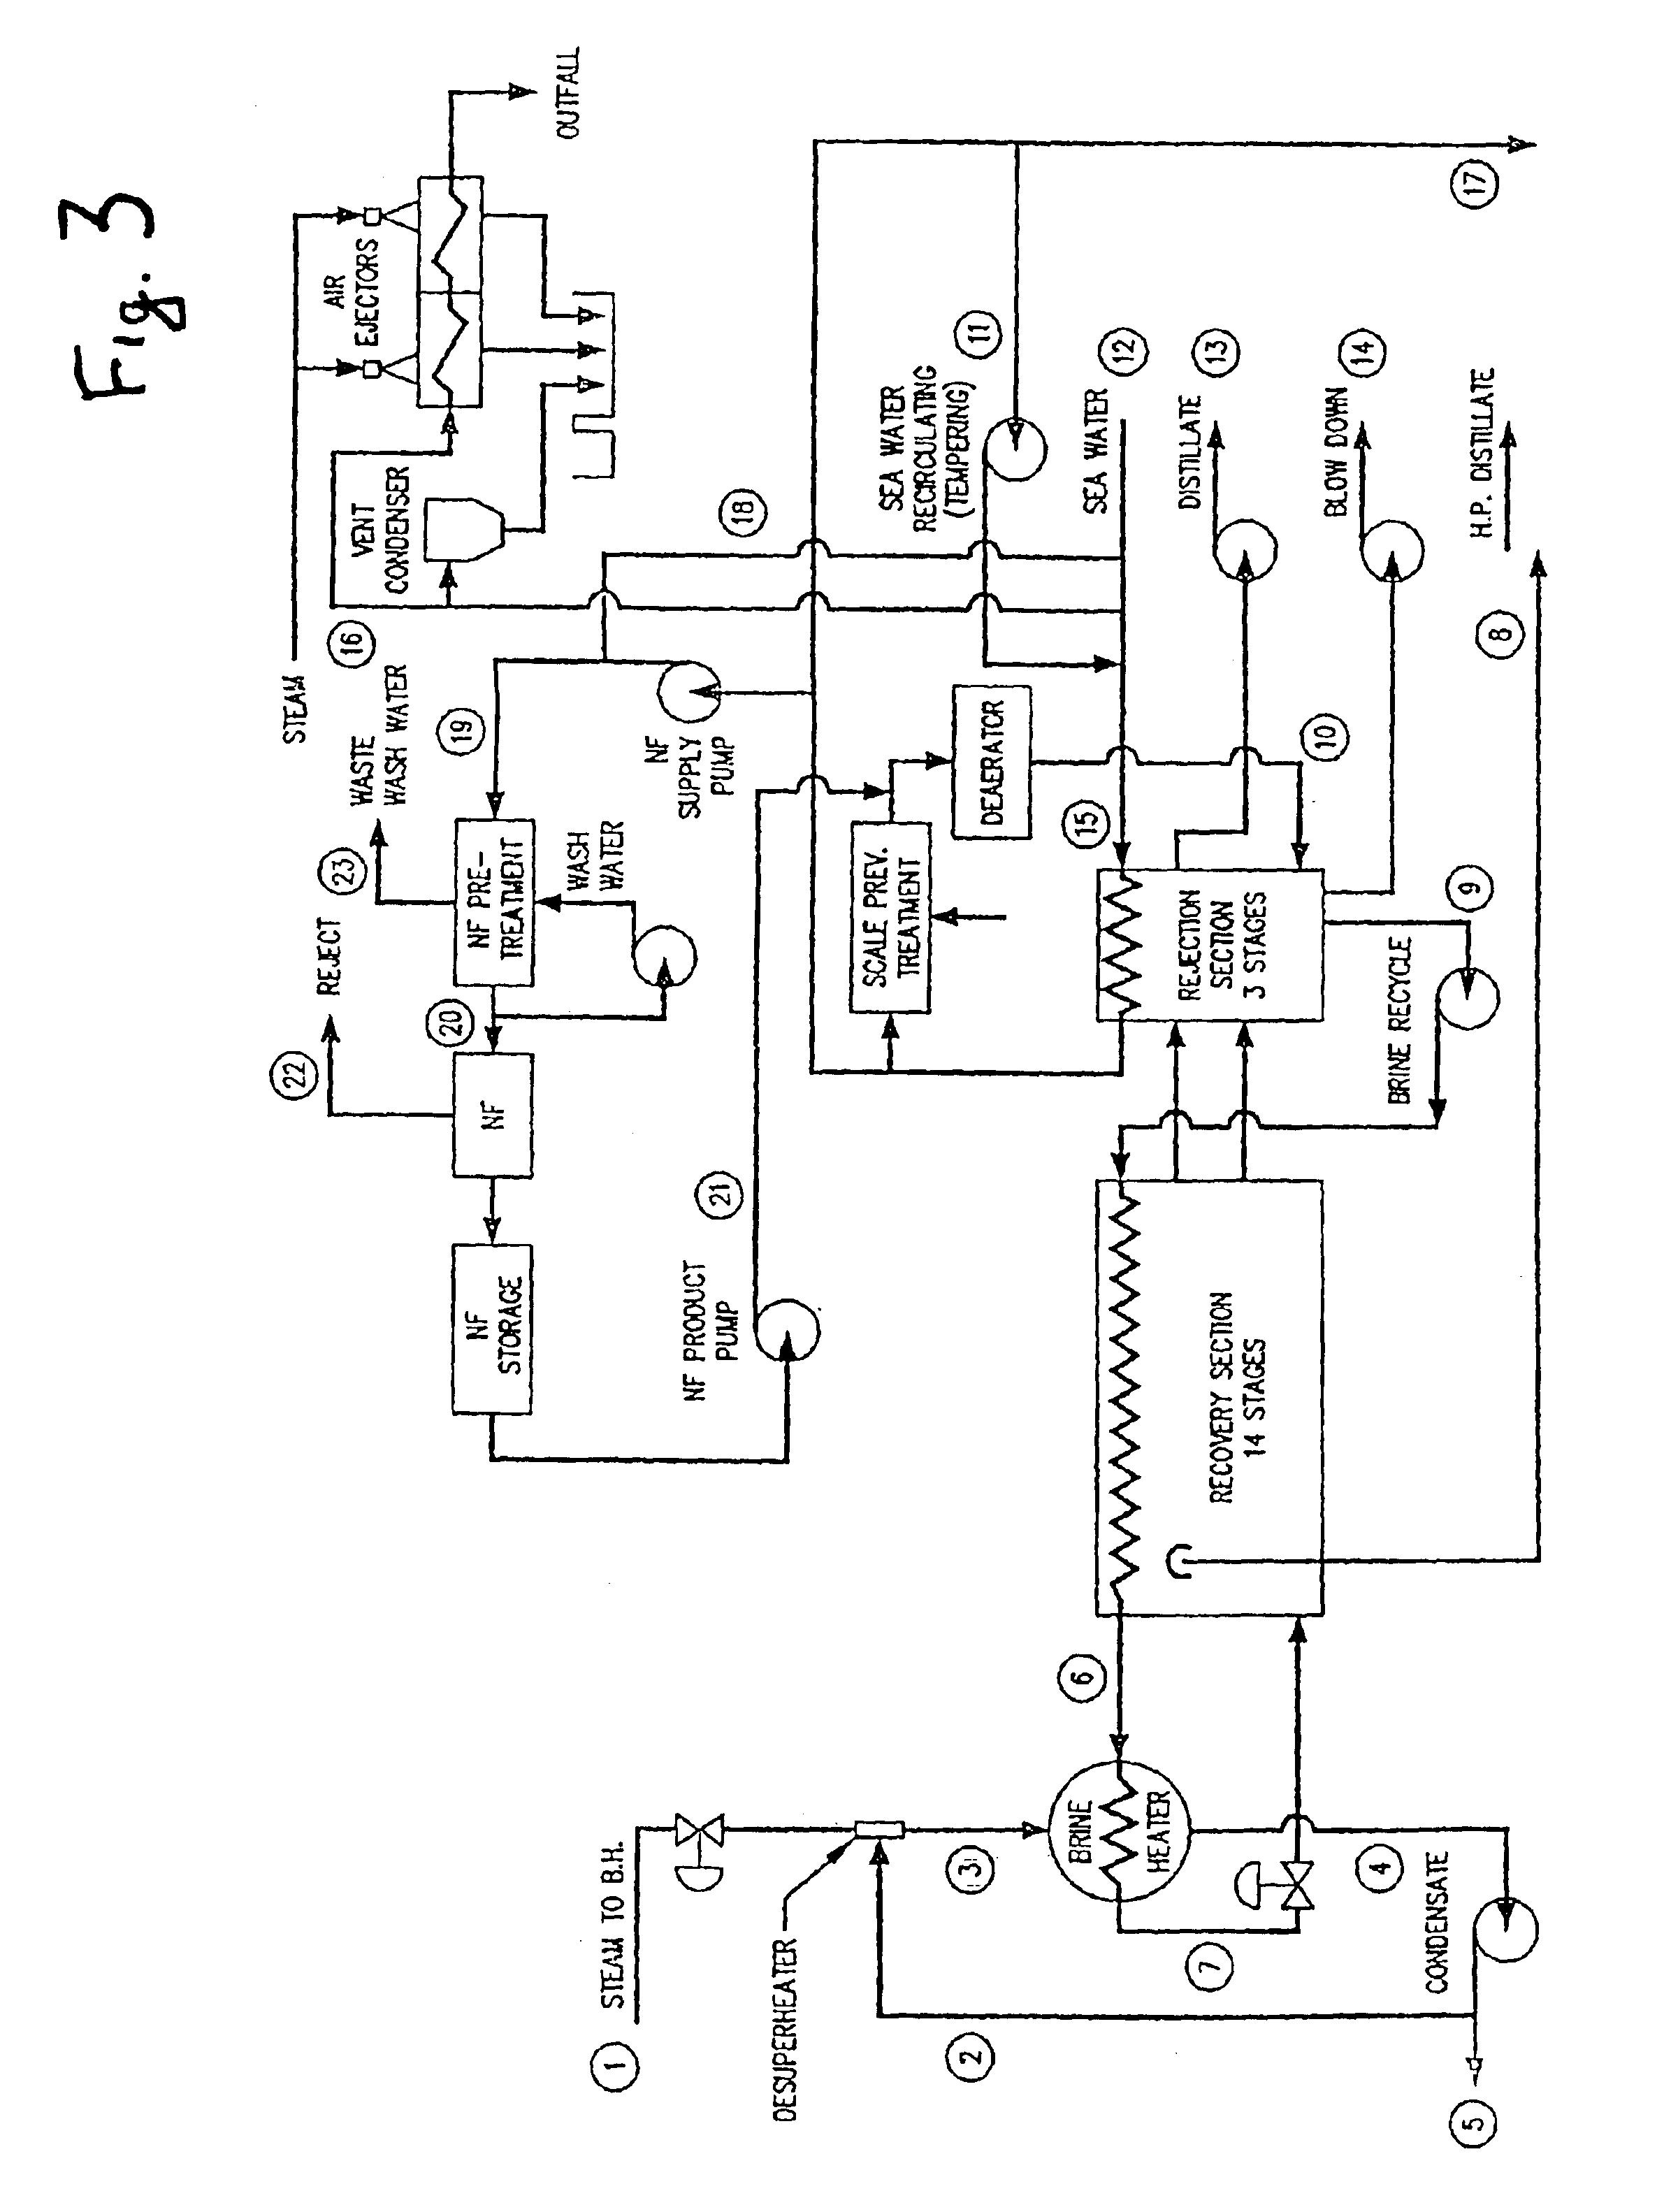 Patent US Salt water desalination process using ion